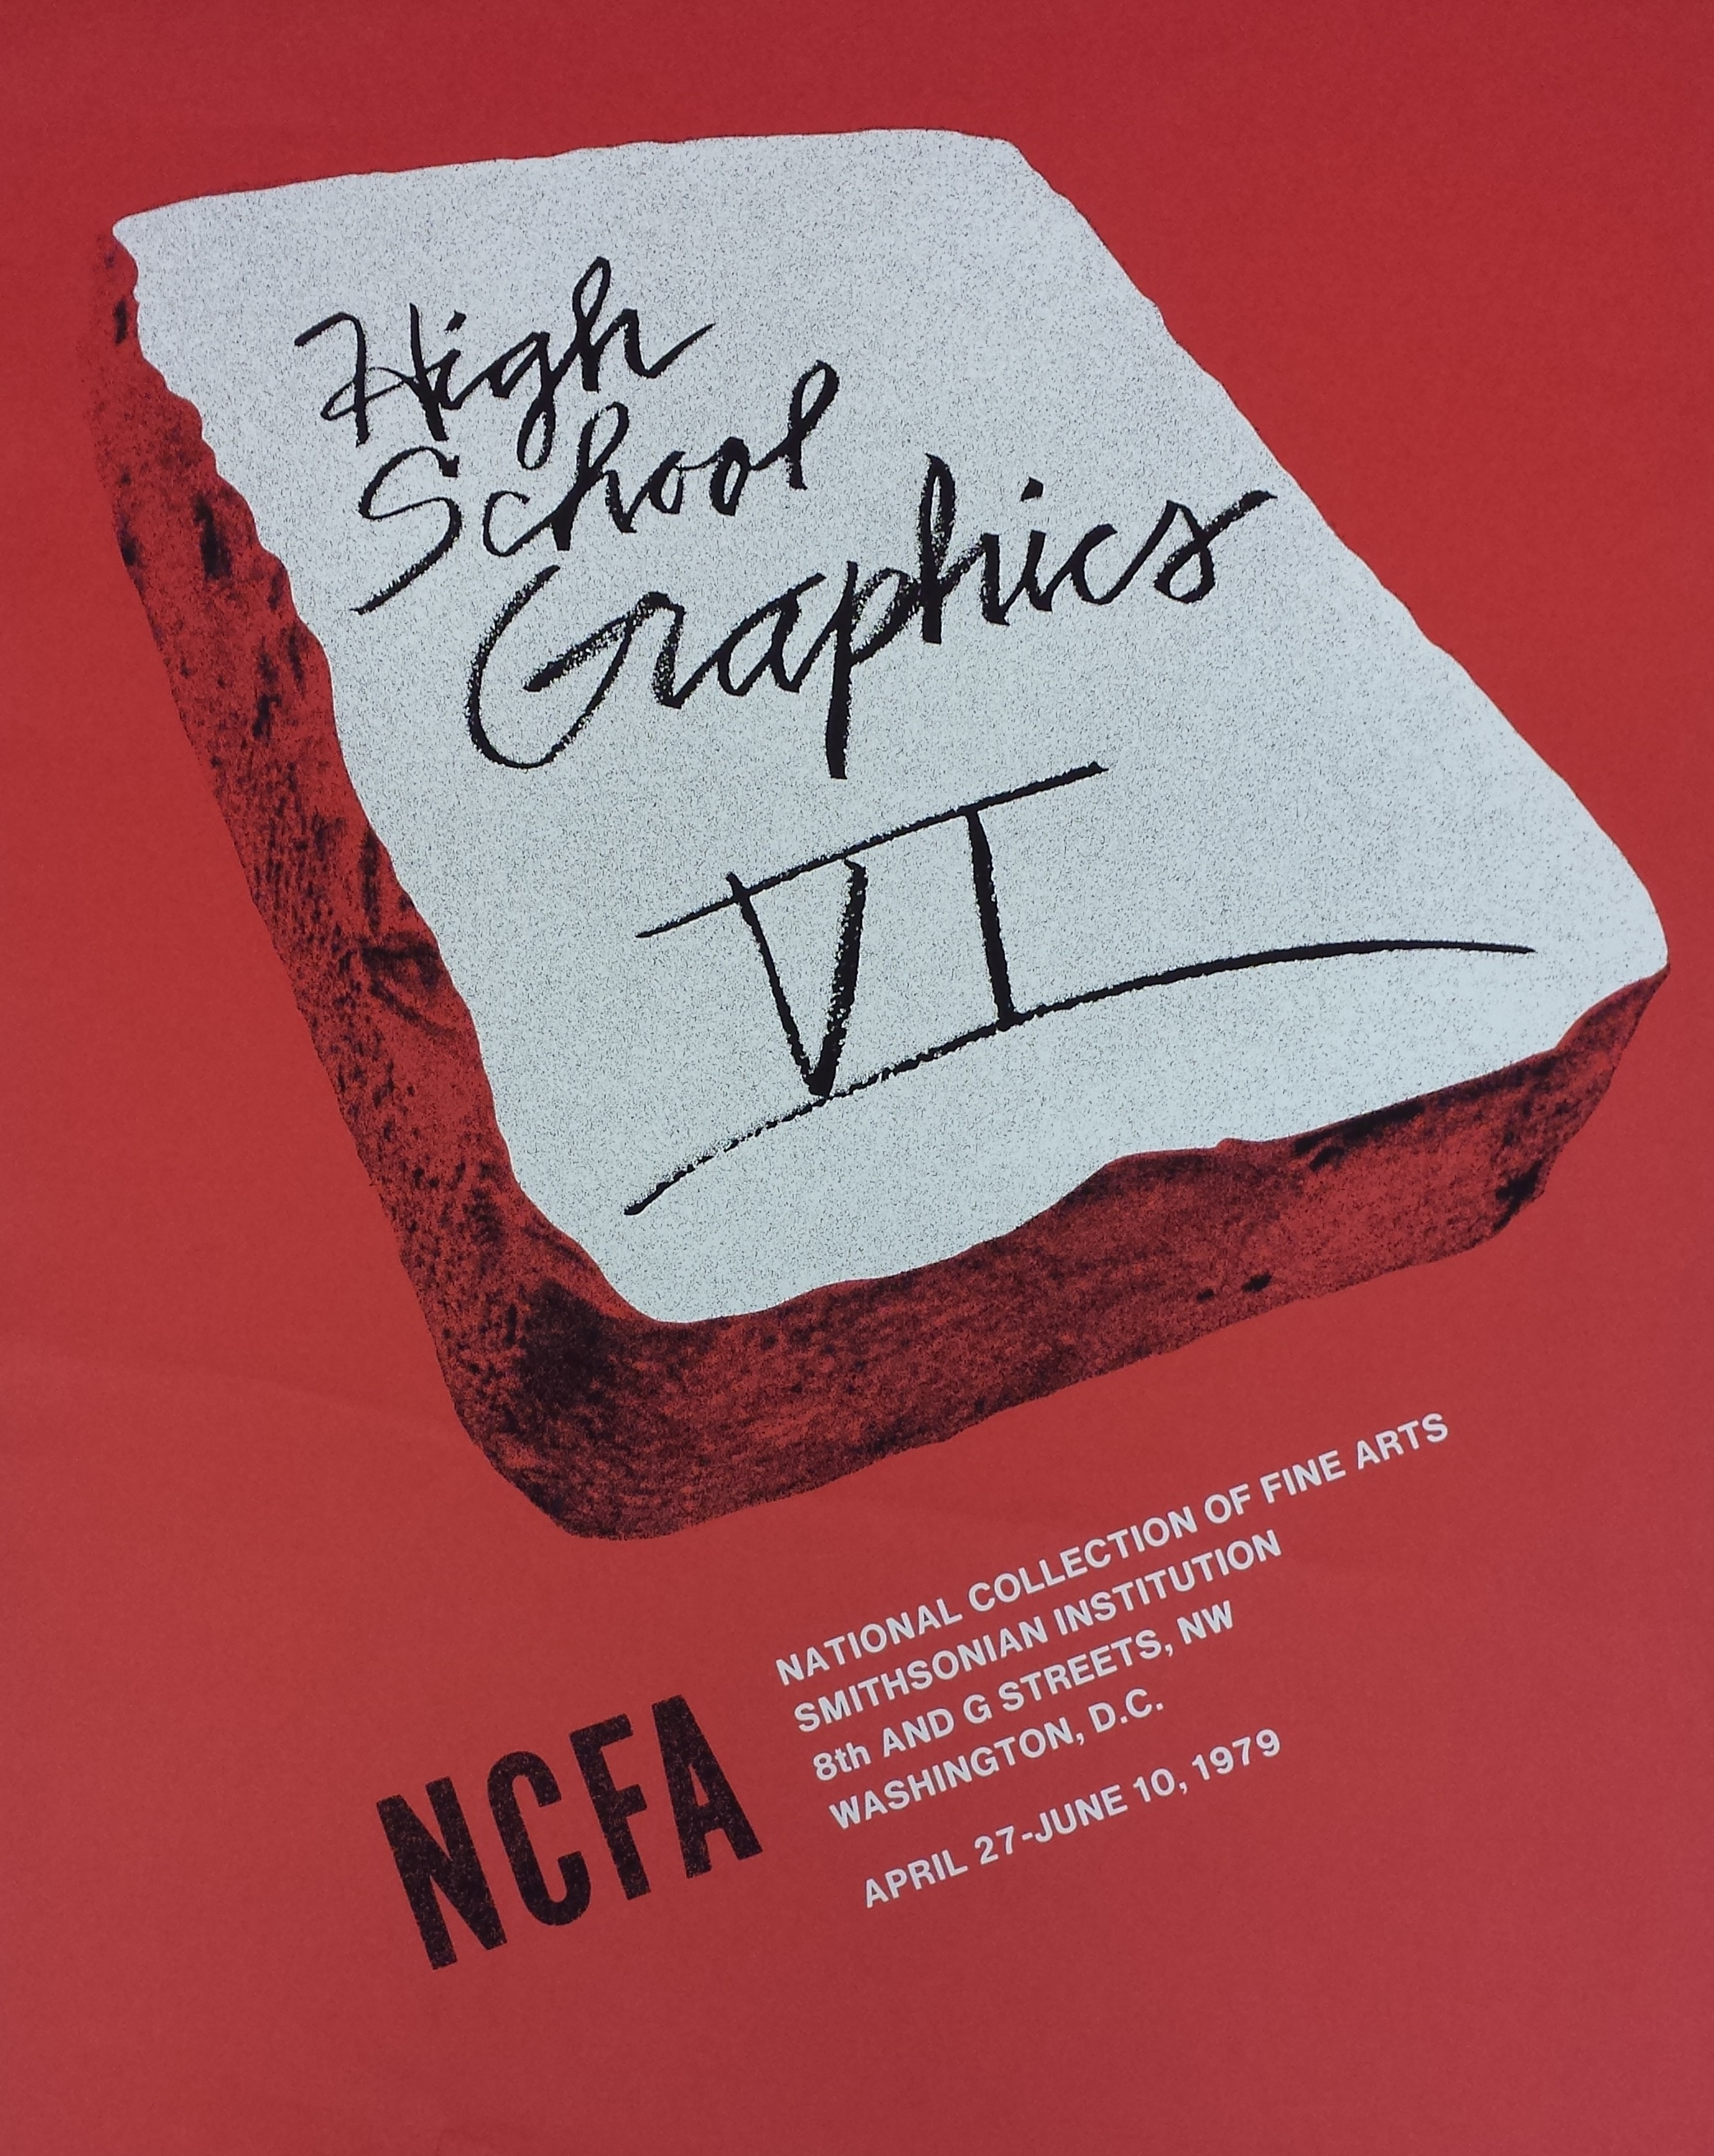 High School Graphics VI, 1979.